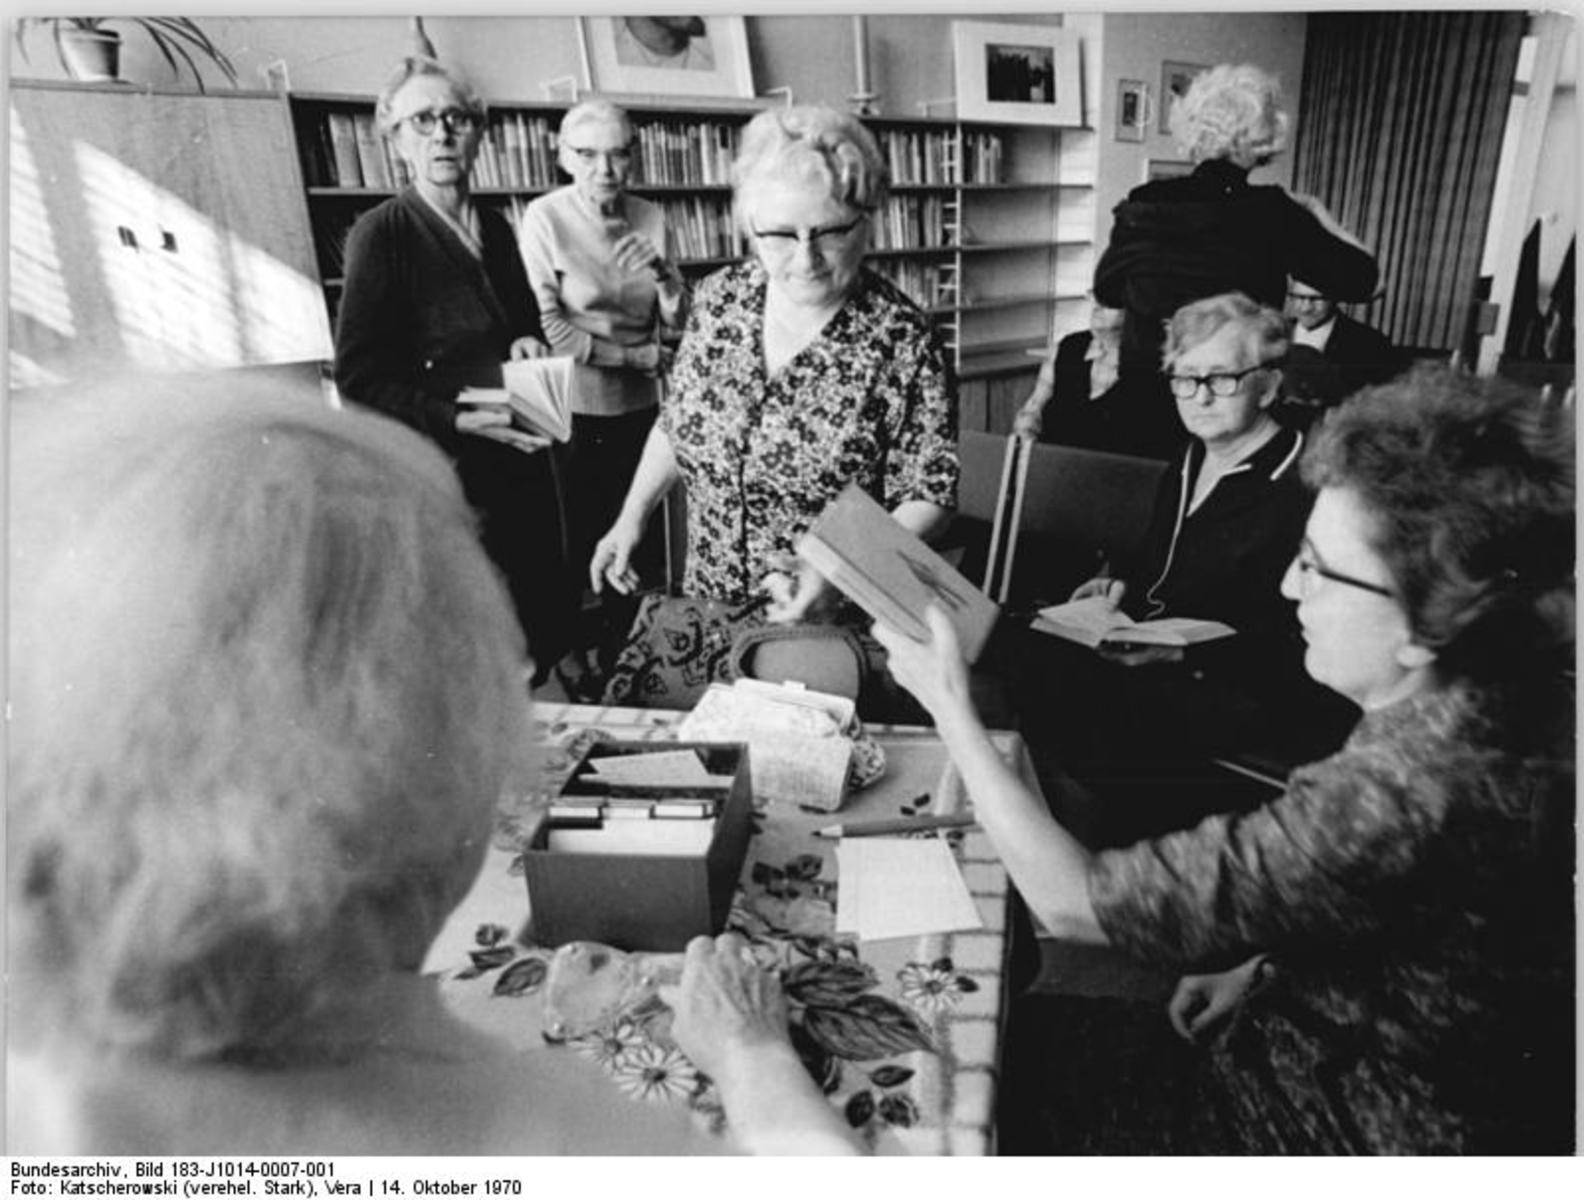 Bundesarchiv_Bild_183-J1014-0007-001,_Berlin,_Altenheim,_Bibliothek.jpg